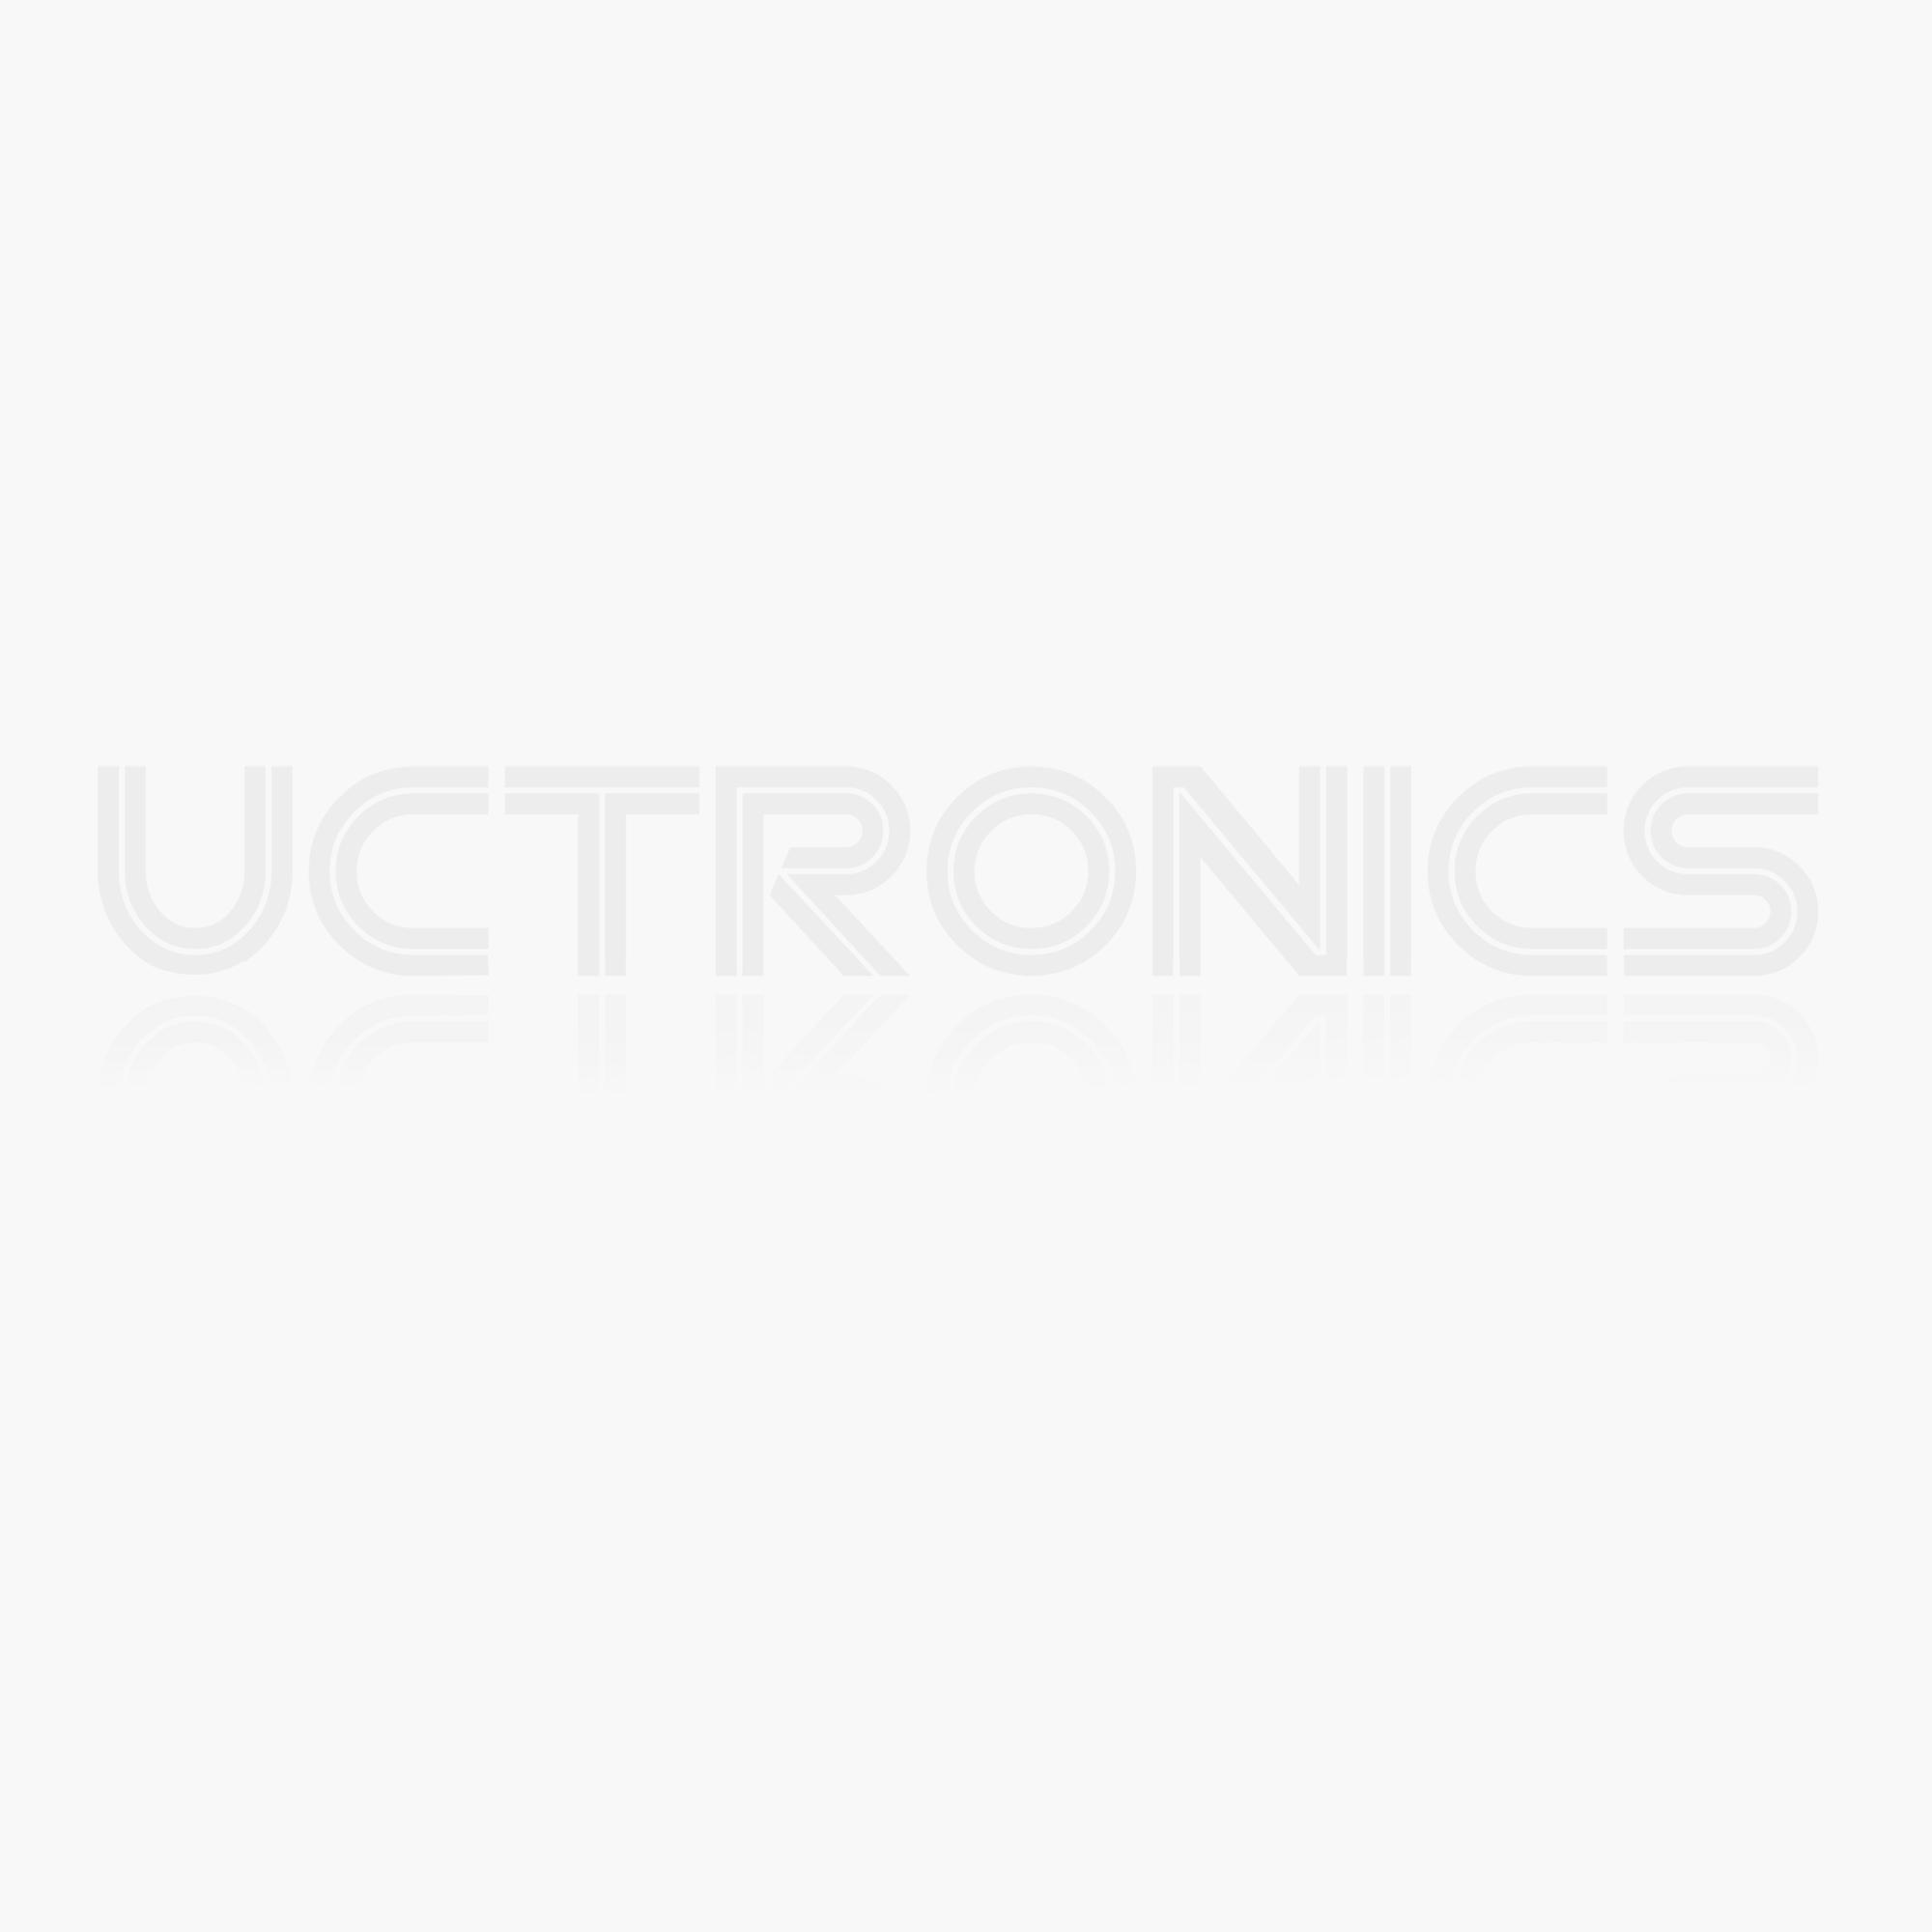 Arducam Auto Focus Camera, Autofocus for Raspberry Pi Camera Module, Motorized Focus Lens, OV5647 5MP 1080P, Compatible with Pi 4/3B+/3